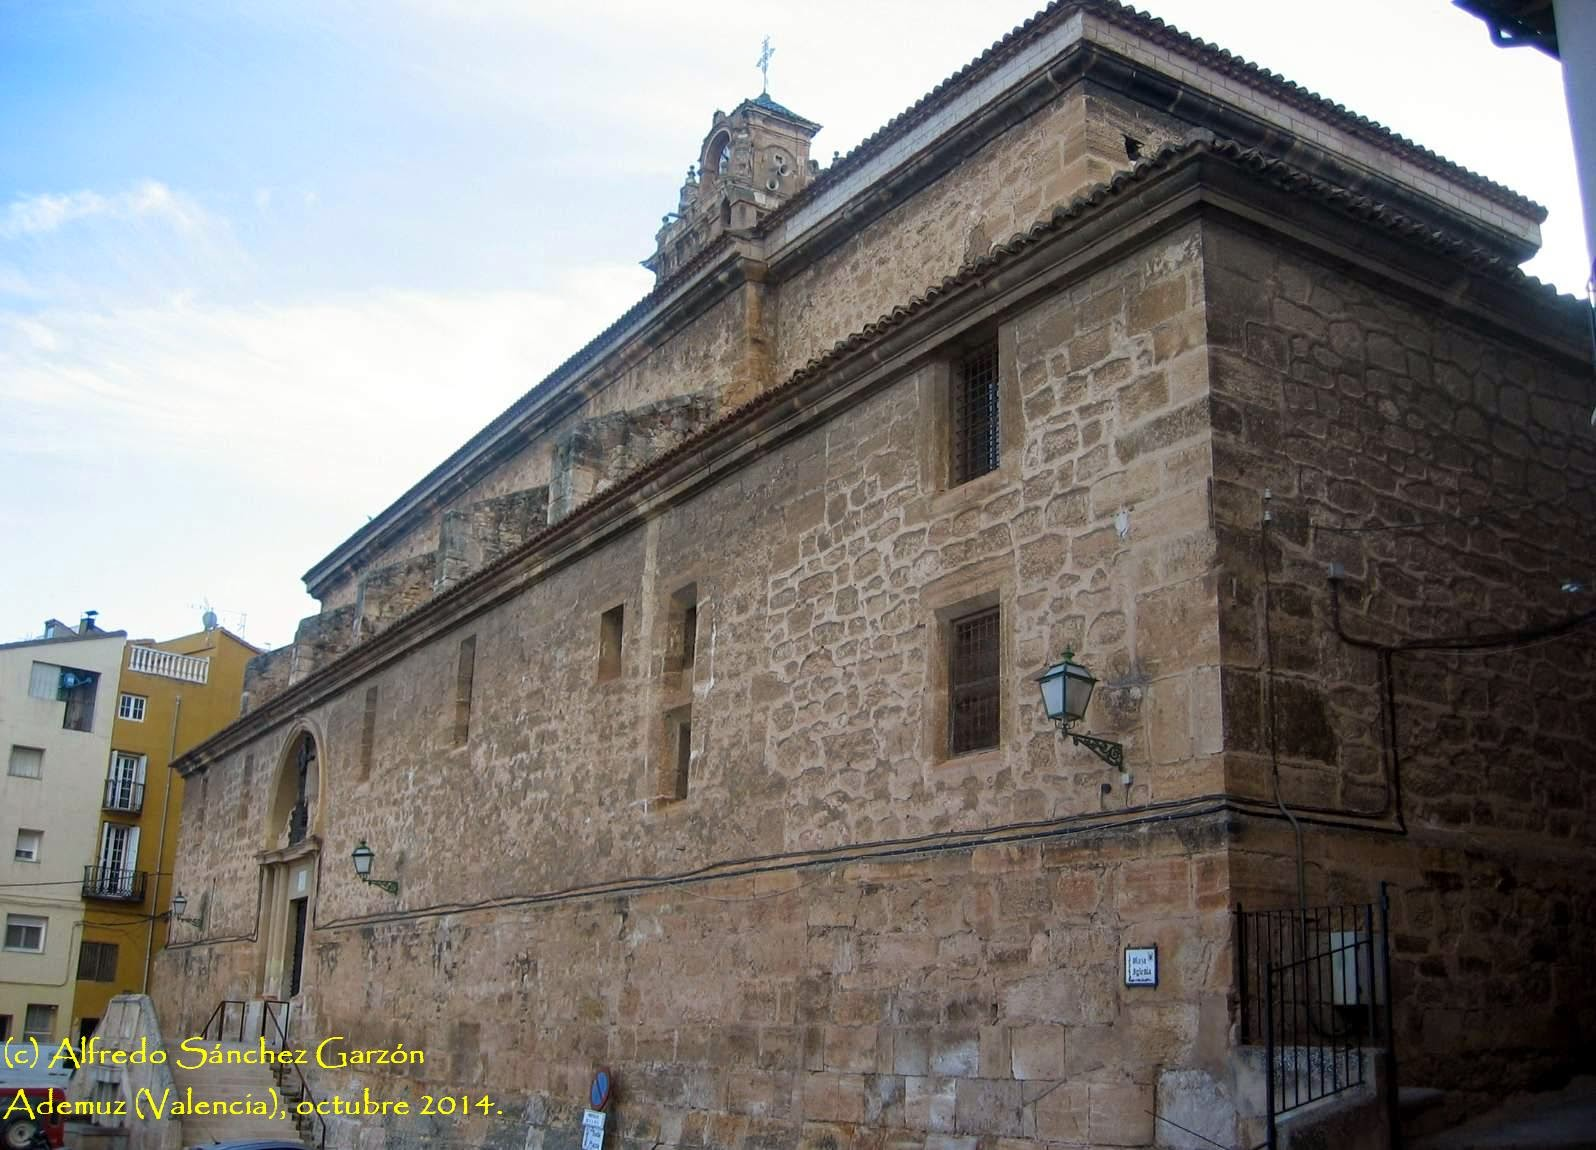 iglesia-parroquial-ademuz-valencia